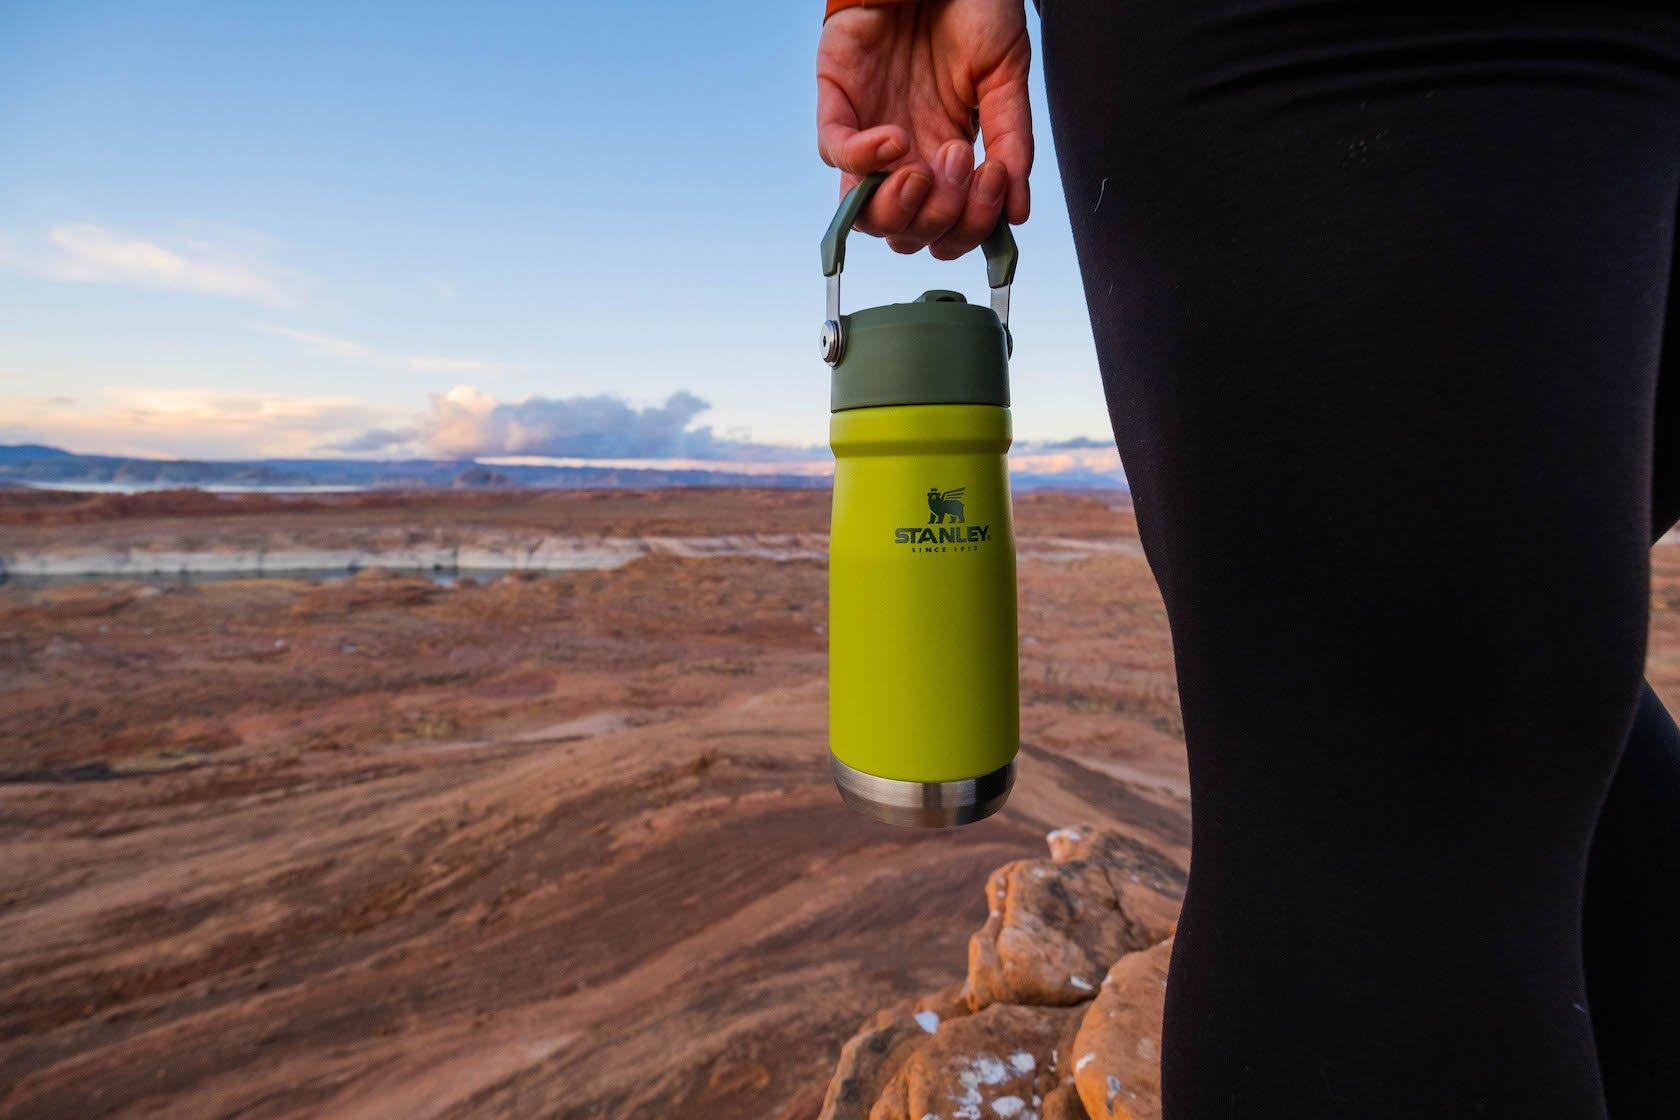 Stanley Iceflow Water Bottle Hiking in the desert